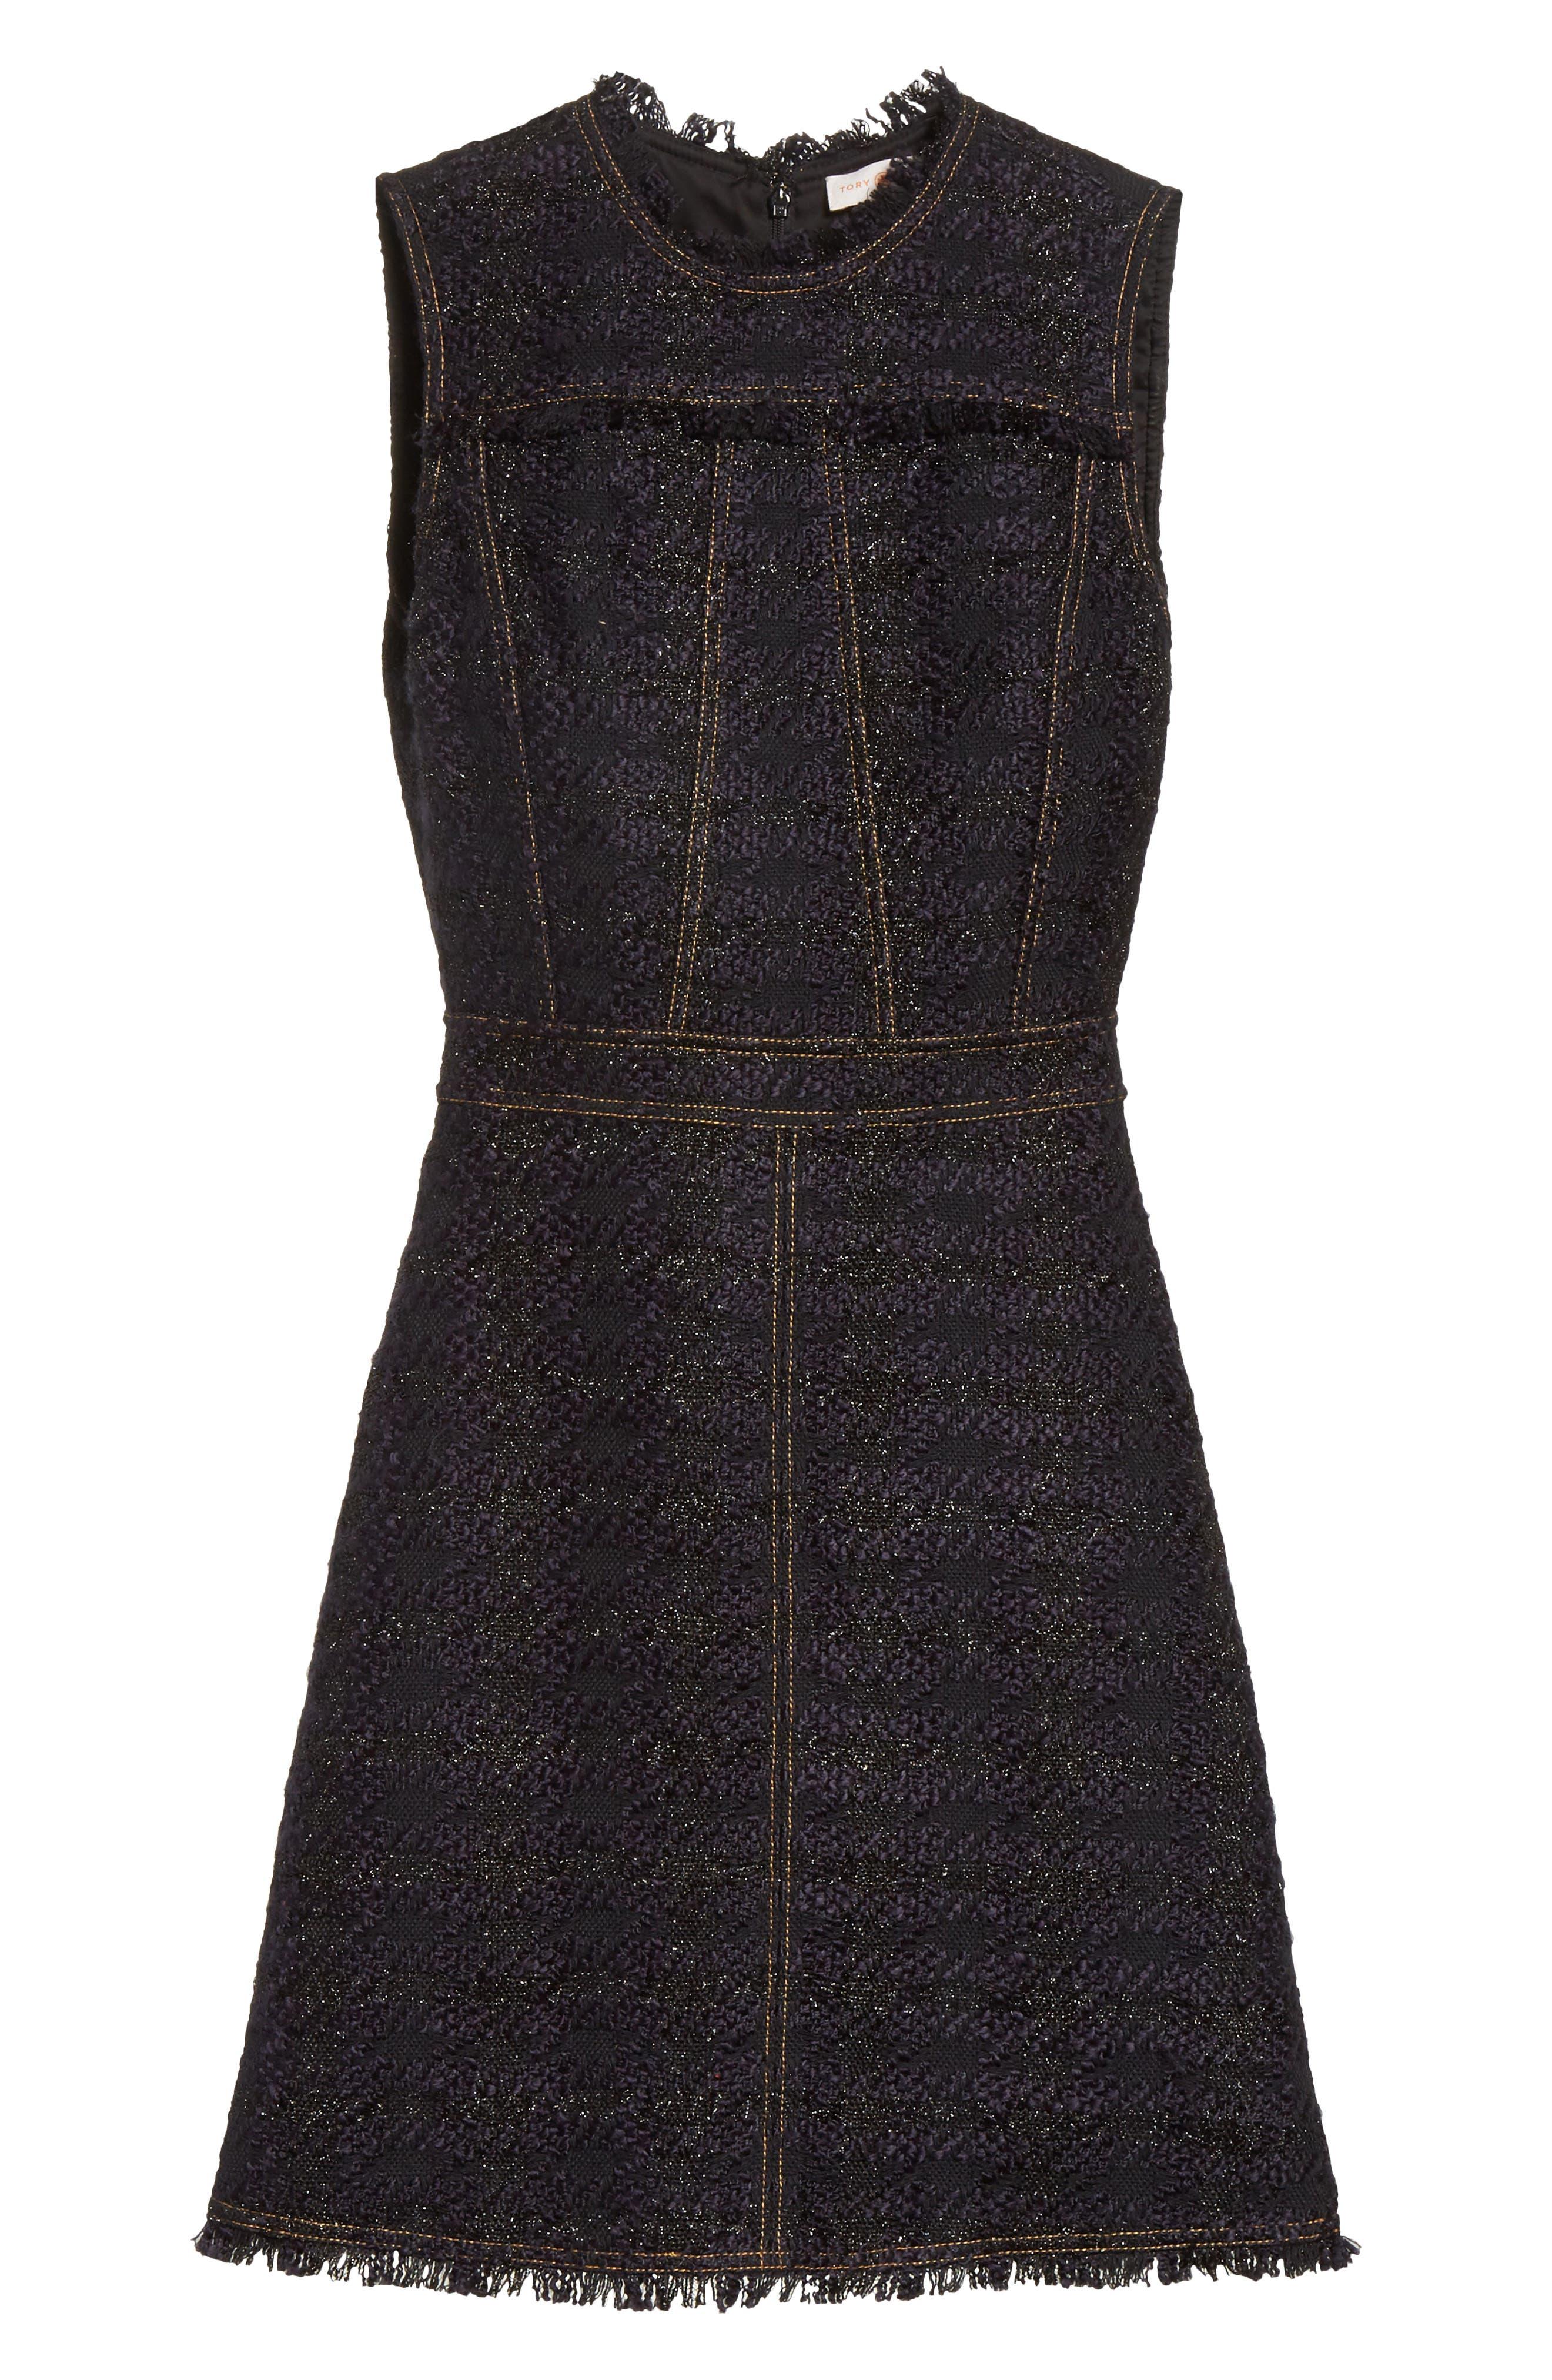 Aria Tweed Sheath Dress,                             Alternate thumbnail 6, color,                             007